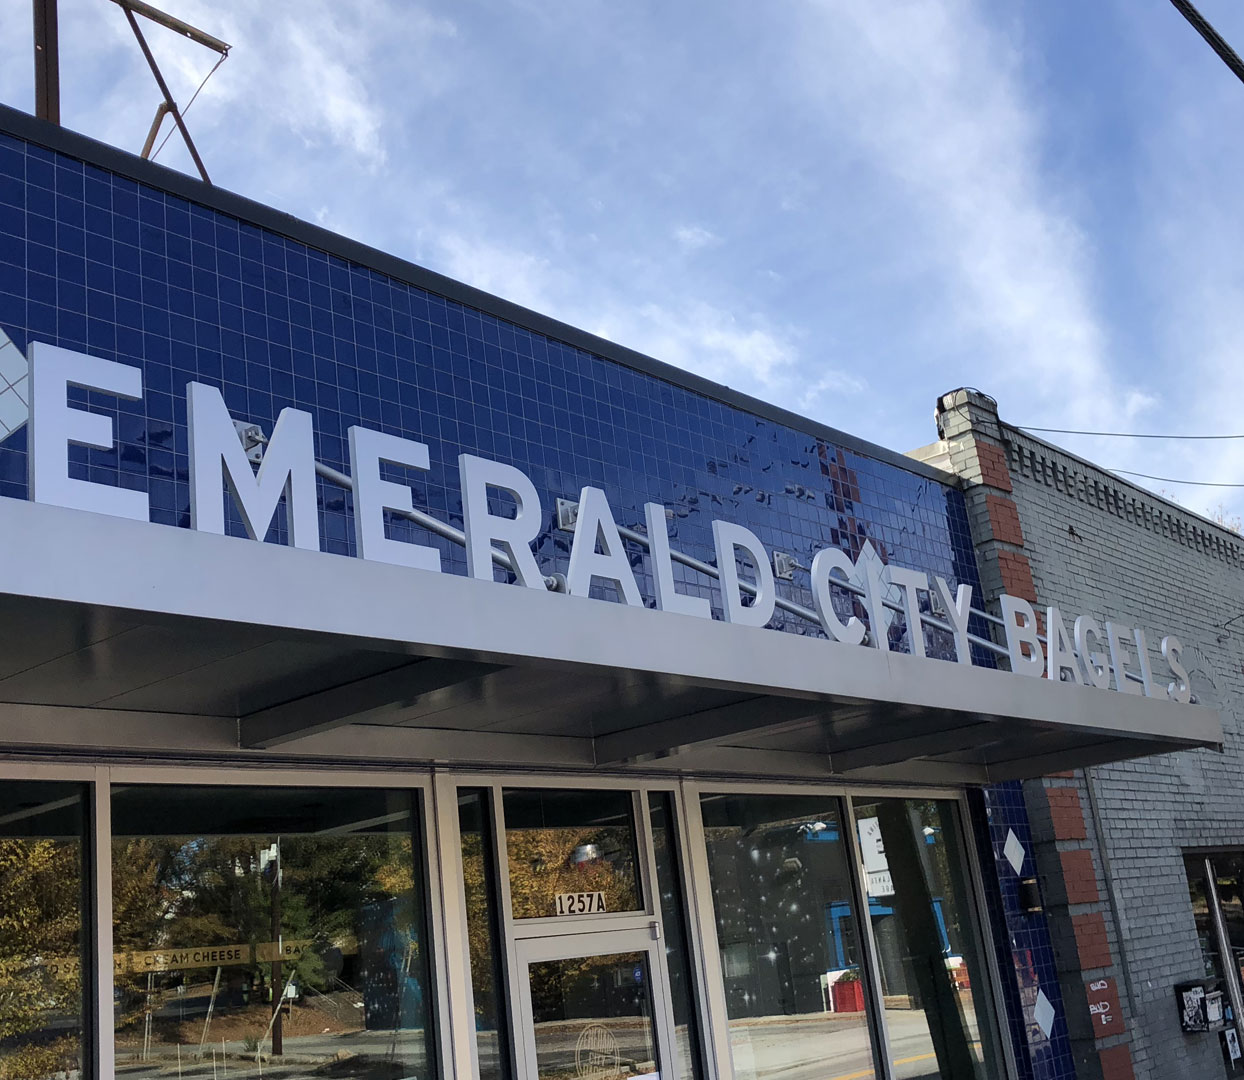 Emerald City Bagels store signage